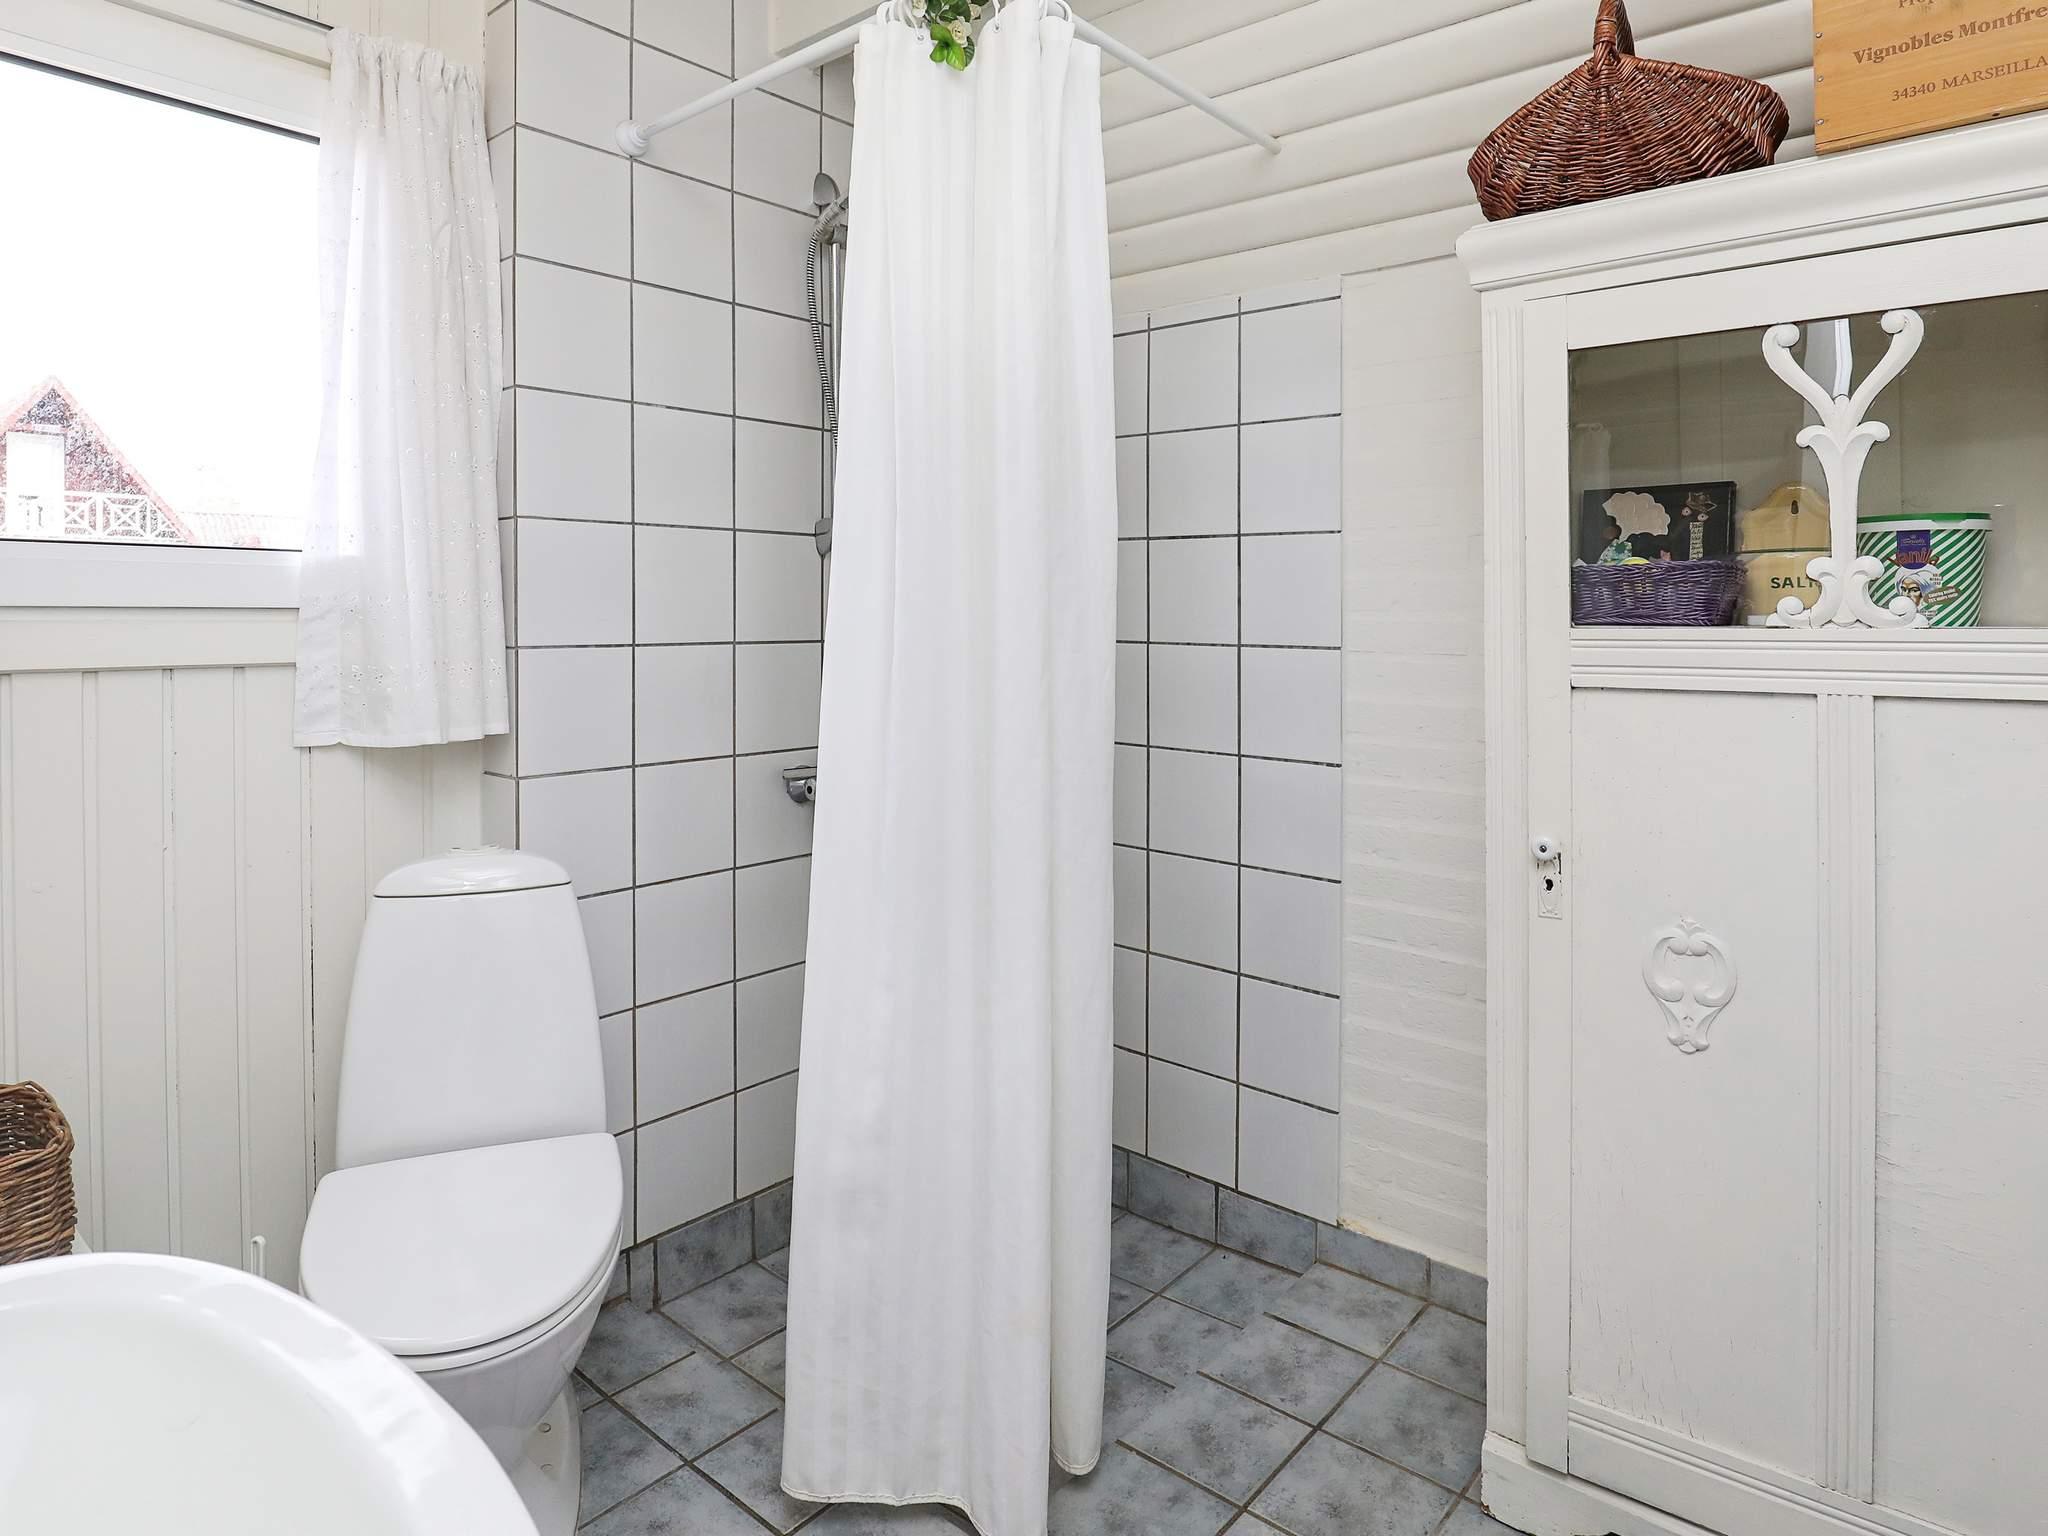 Ferienhaus Vrist (88948), Vrist, , Limfjord, Dänemark, Bild 3